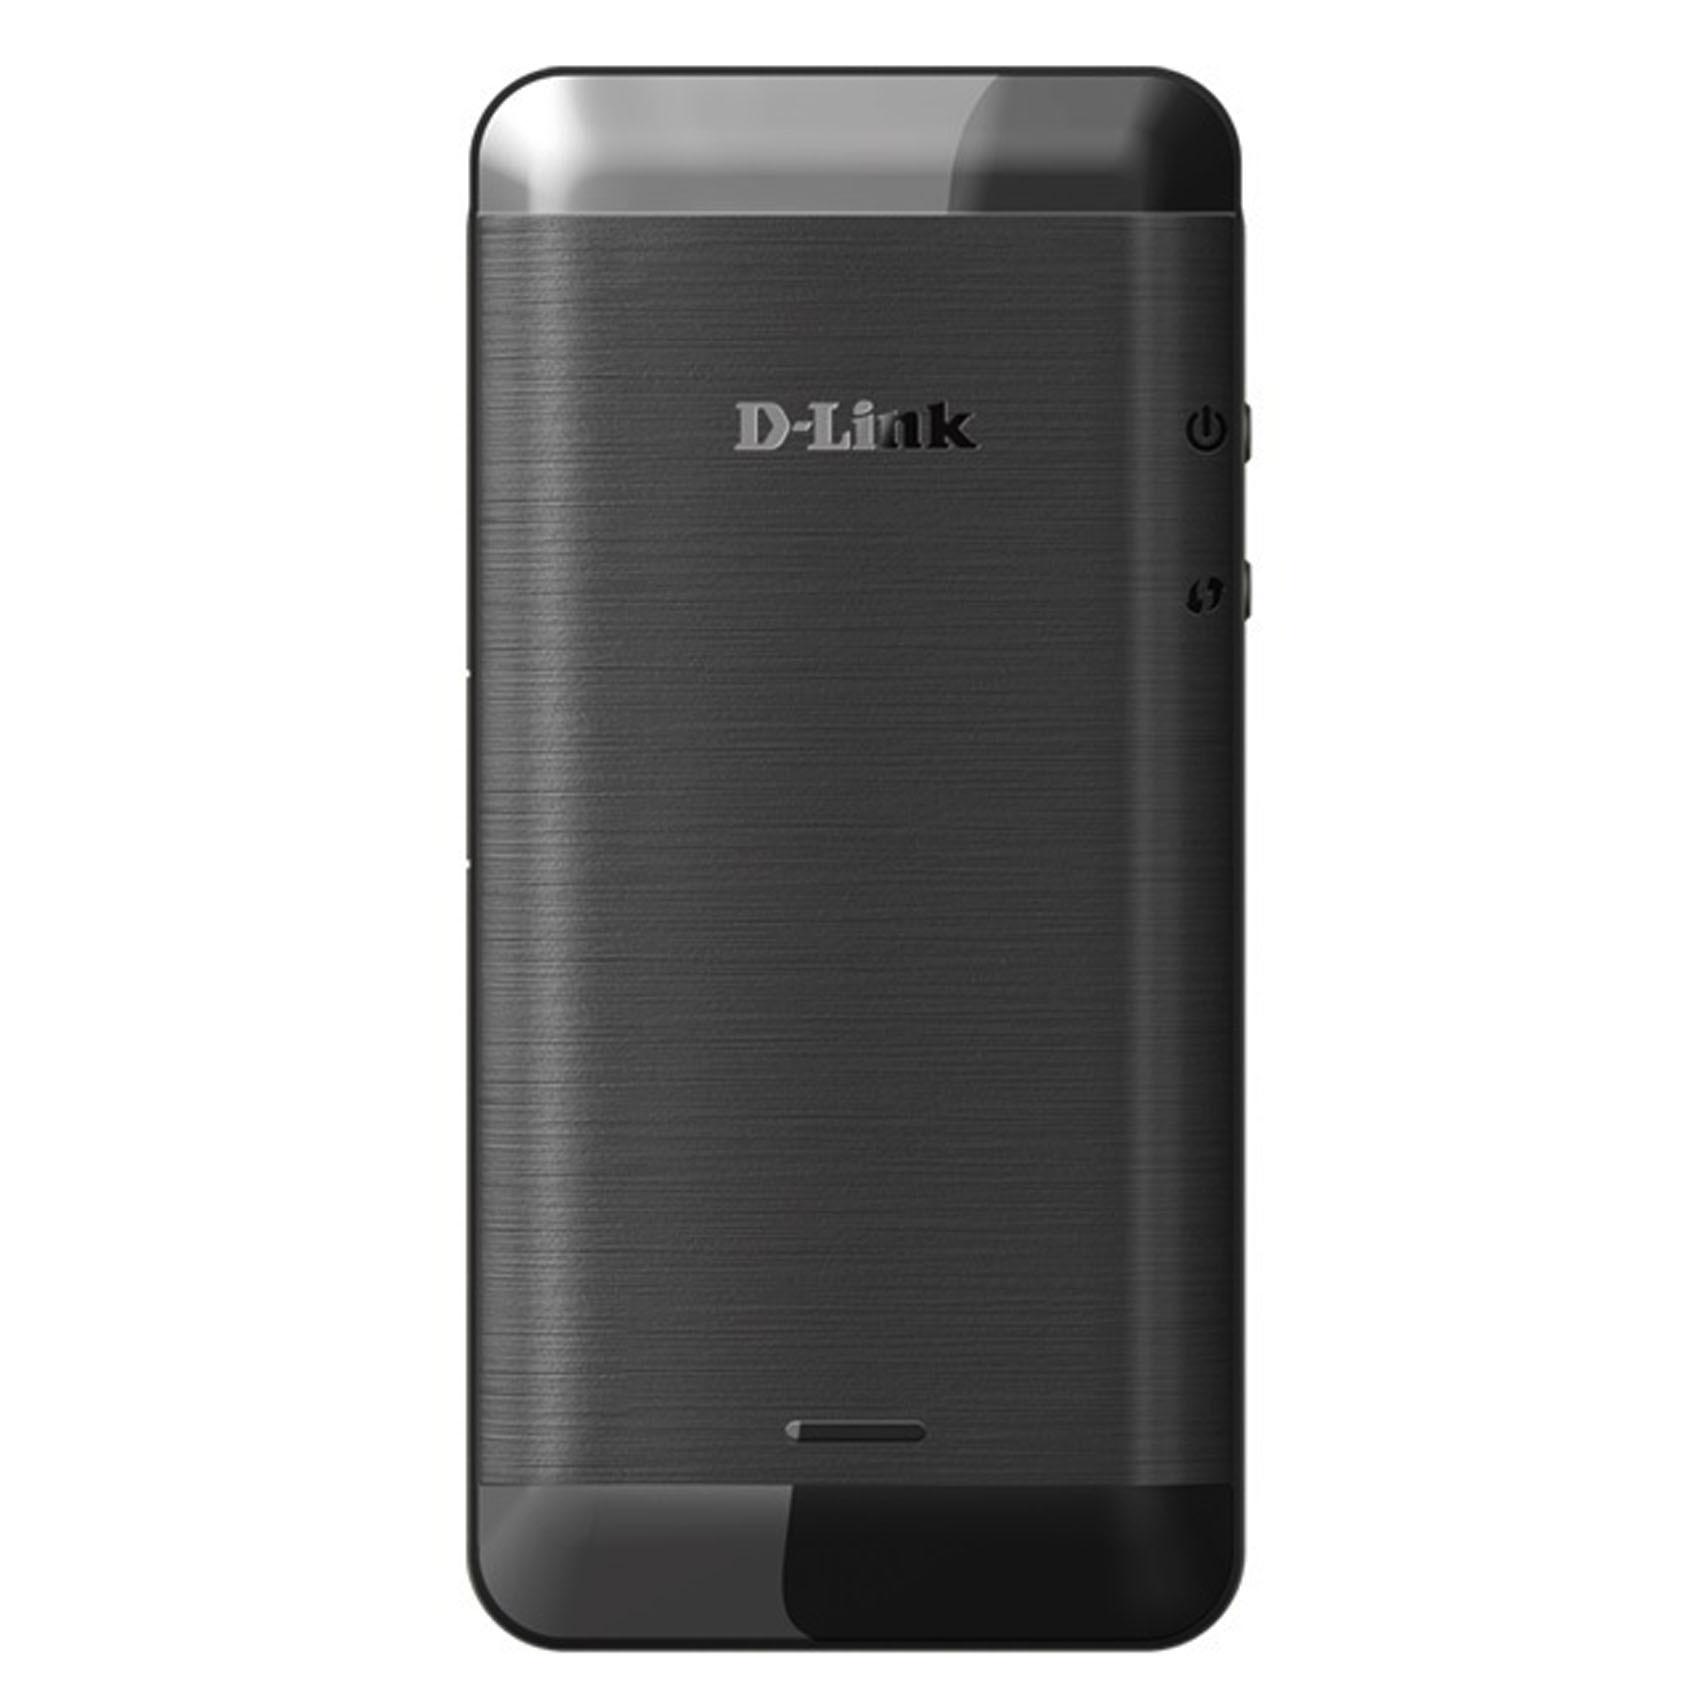 D-LINK W/L RTR DL-DWR720 3G